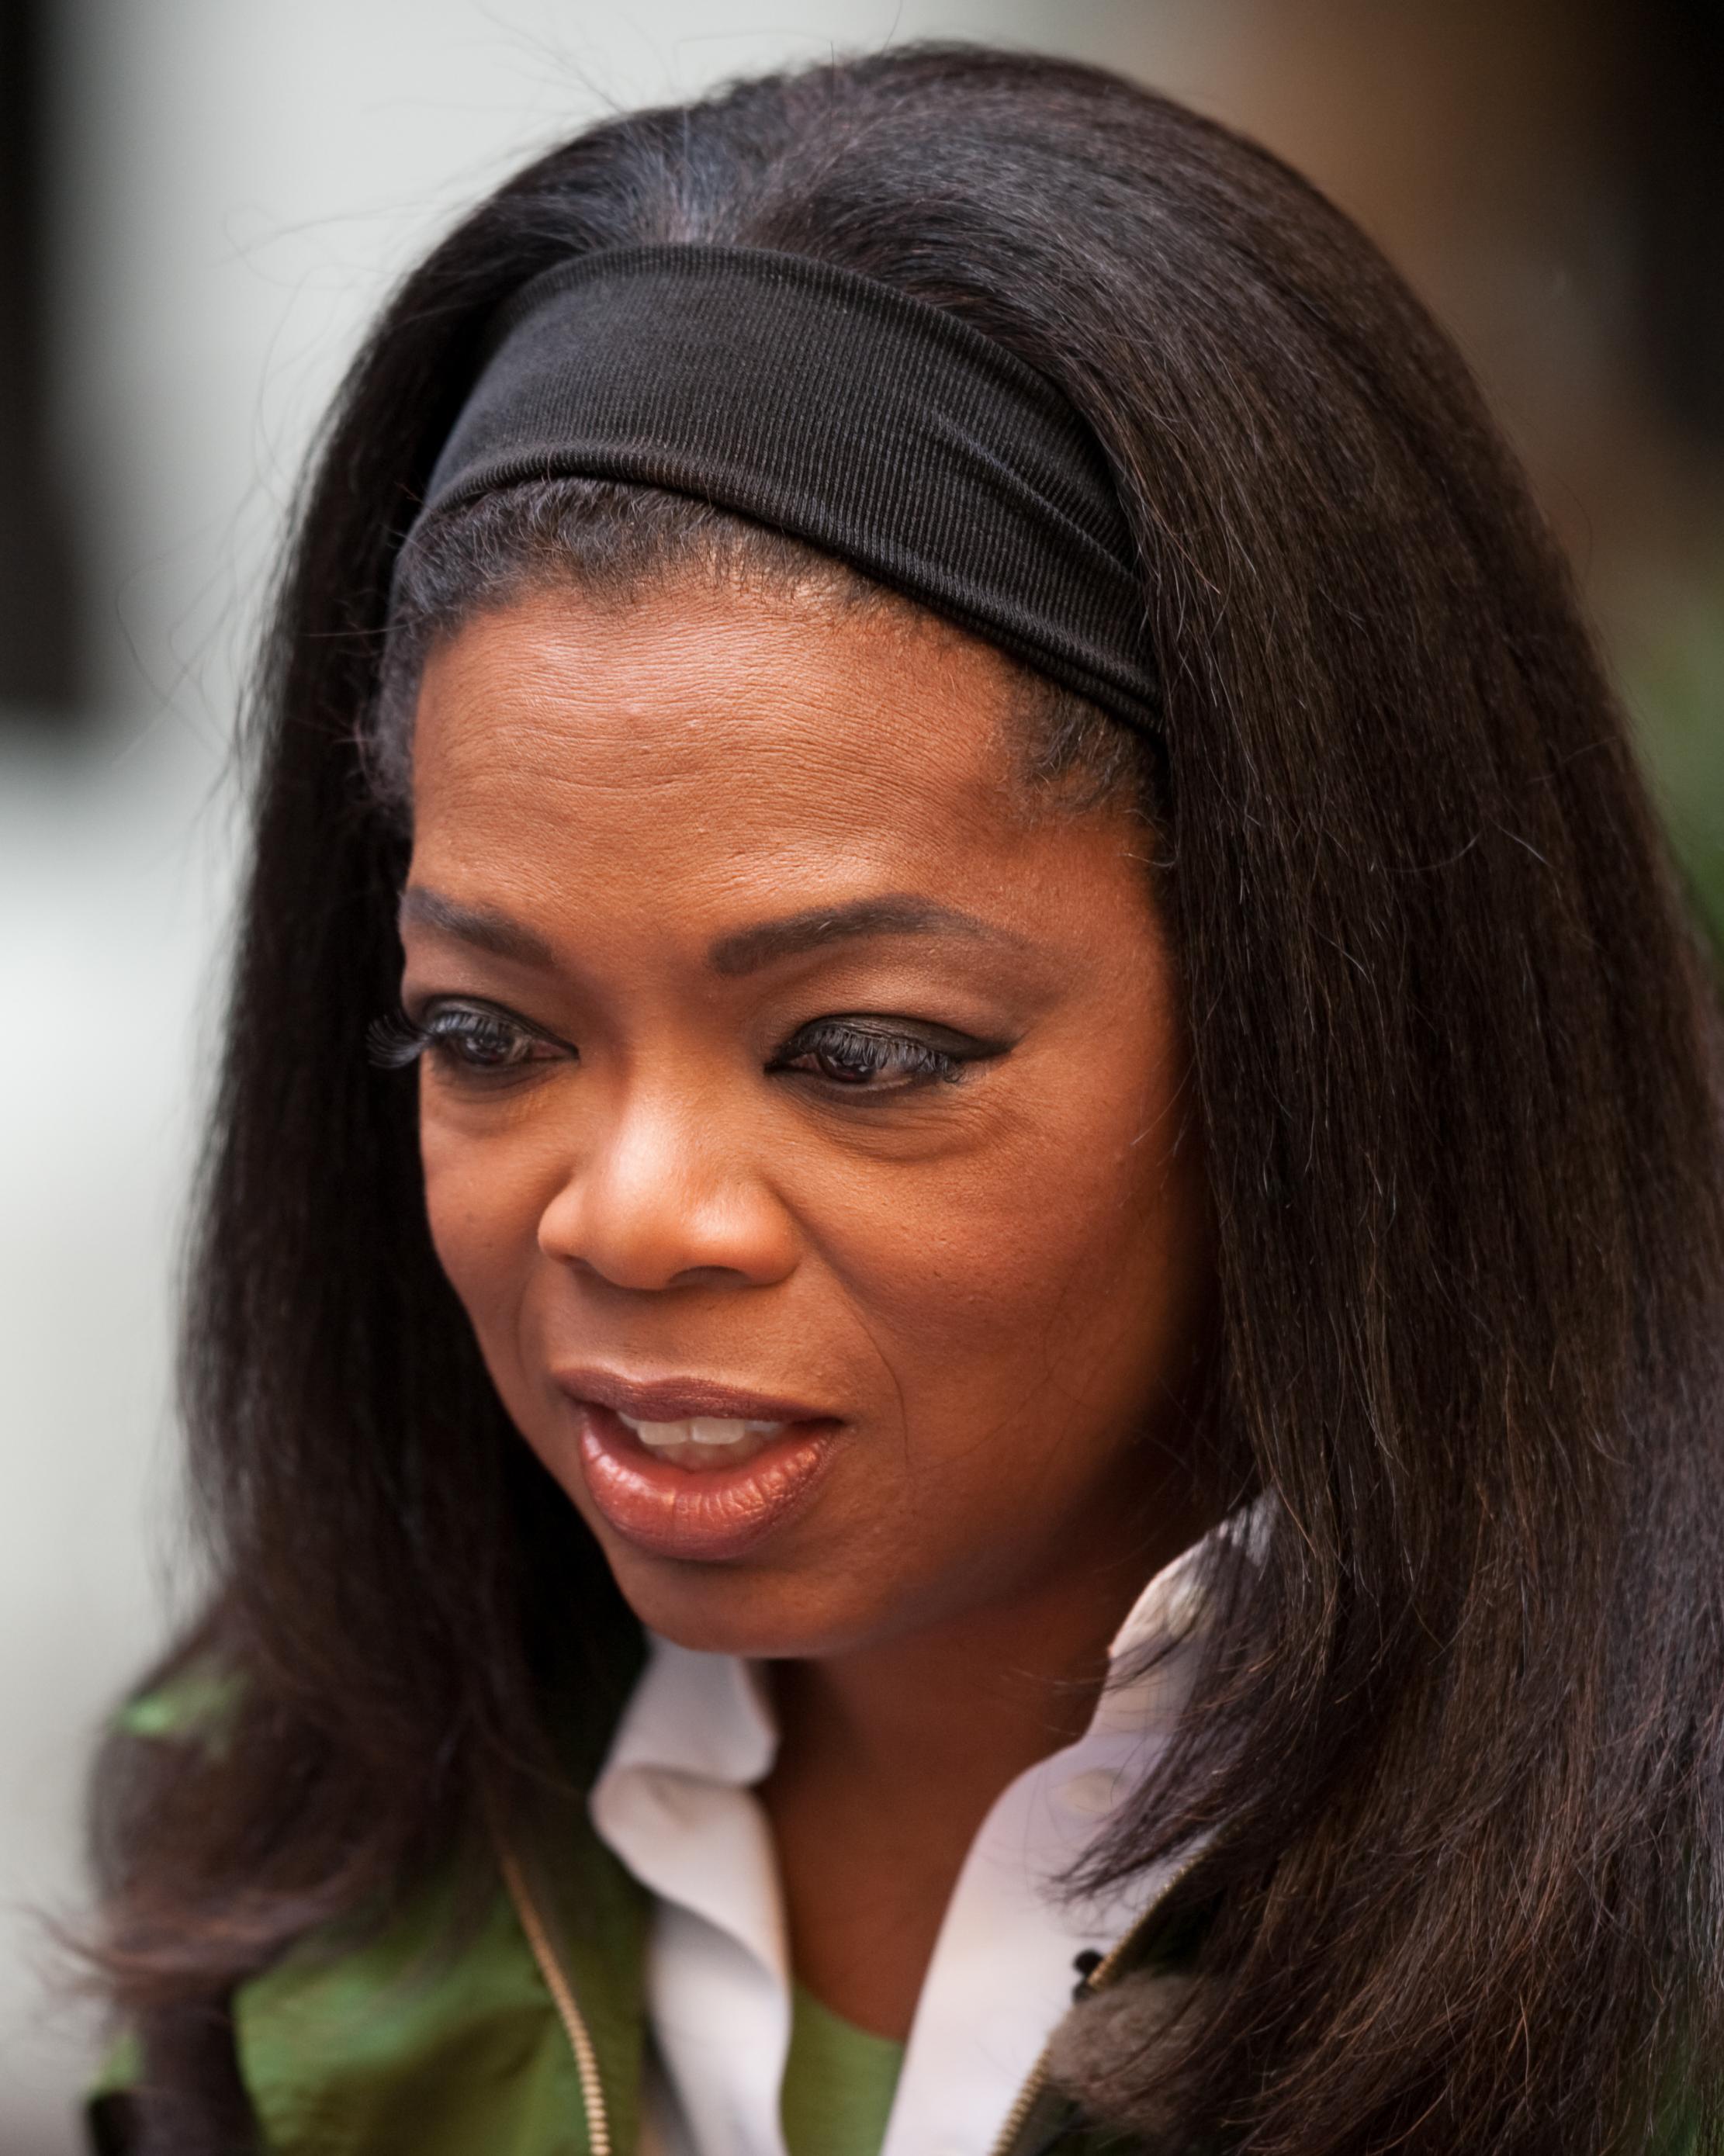 File:Oprah Winfrey in Strøget, Denmark on 30 September 2009 (cropped).jpg - 維基百科,自由的百科全書